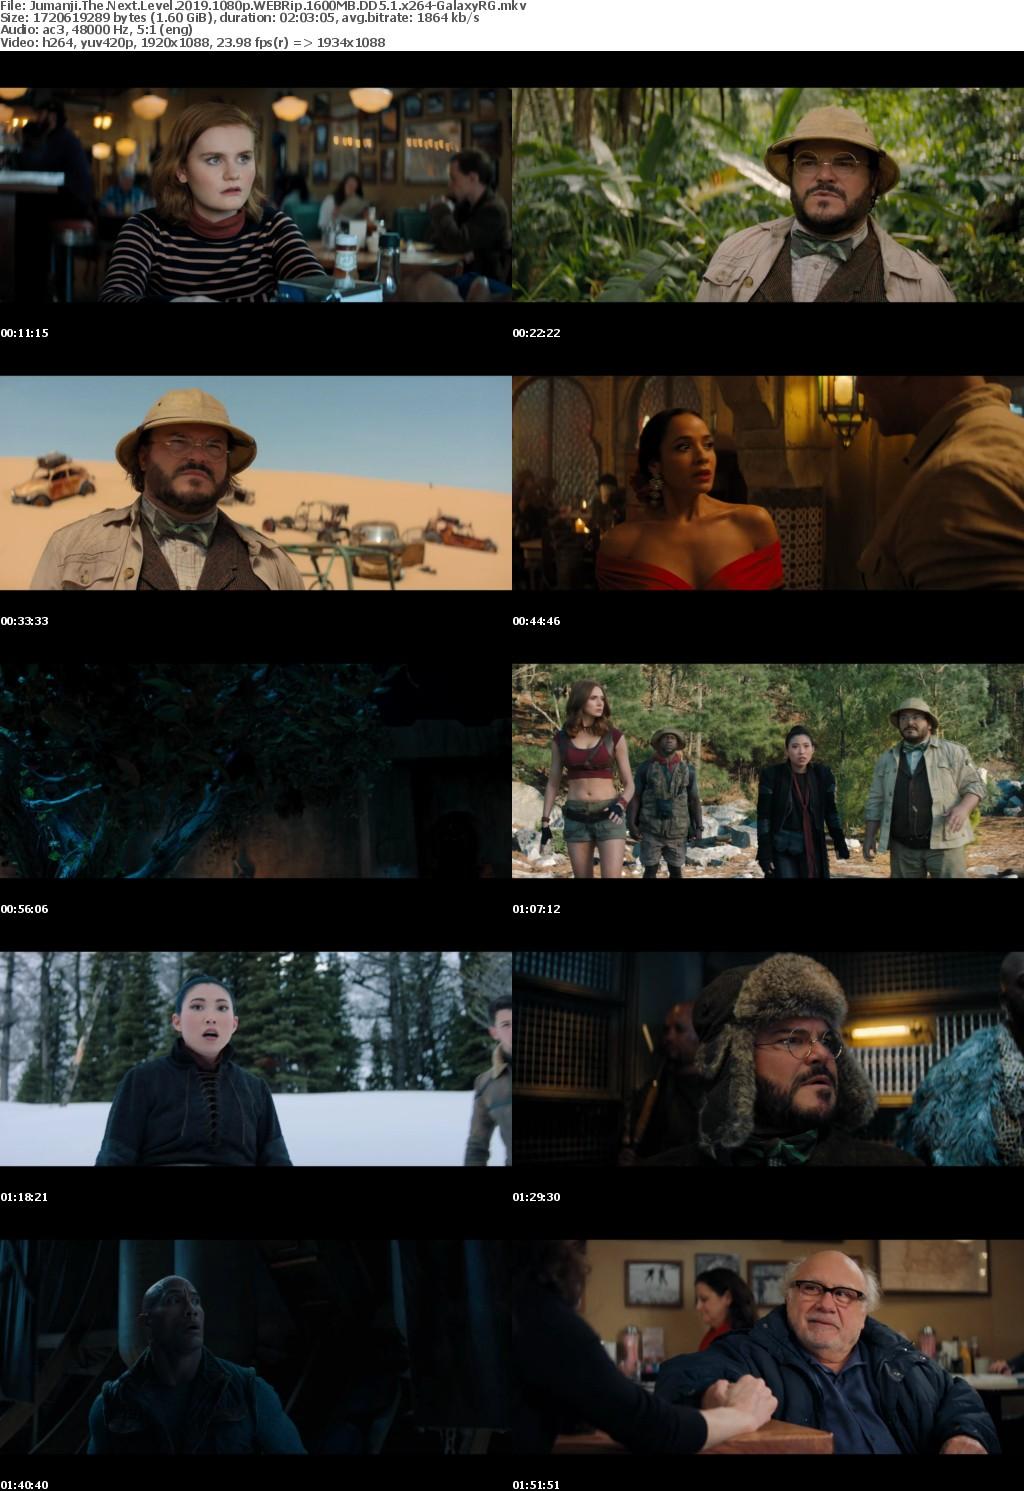 Jumanji The Next Level (2019) 1080p WEBRip 1600MB DD5.1 x264-GalaxyRG